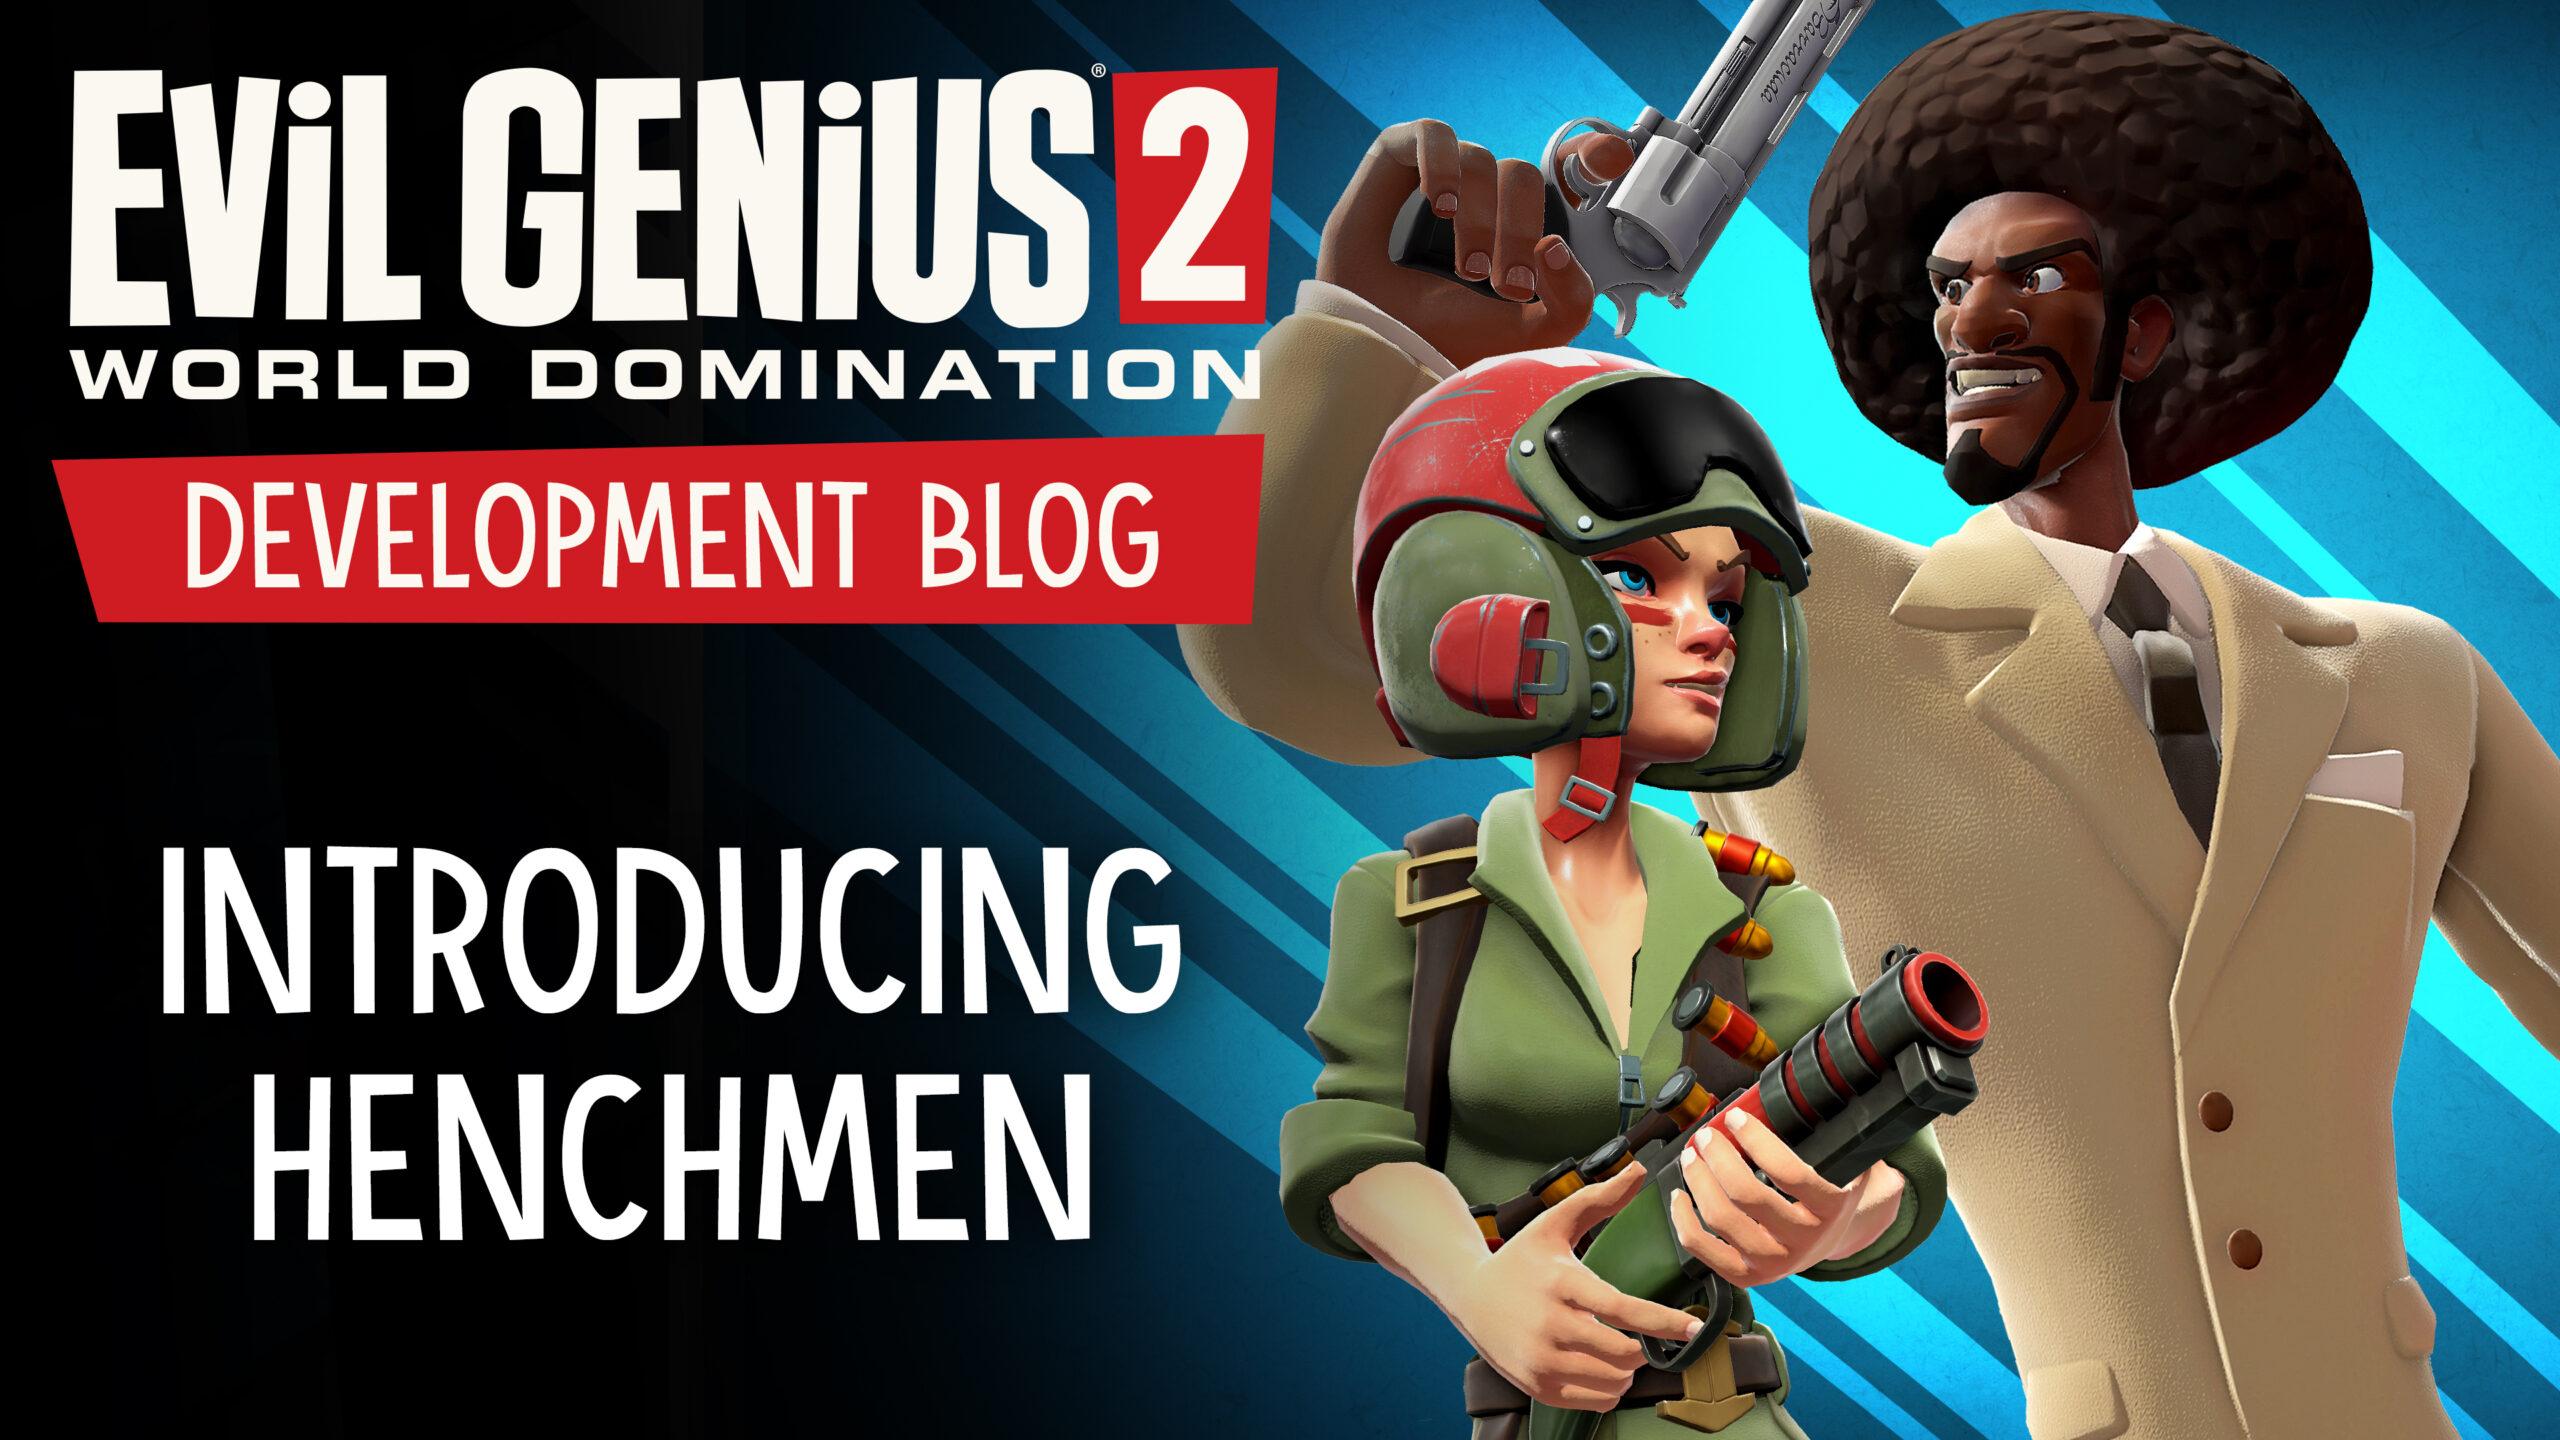 Development Blog – Introducing Henchmen!